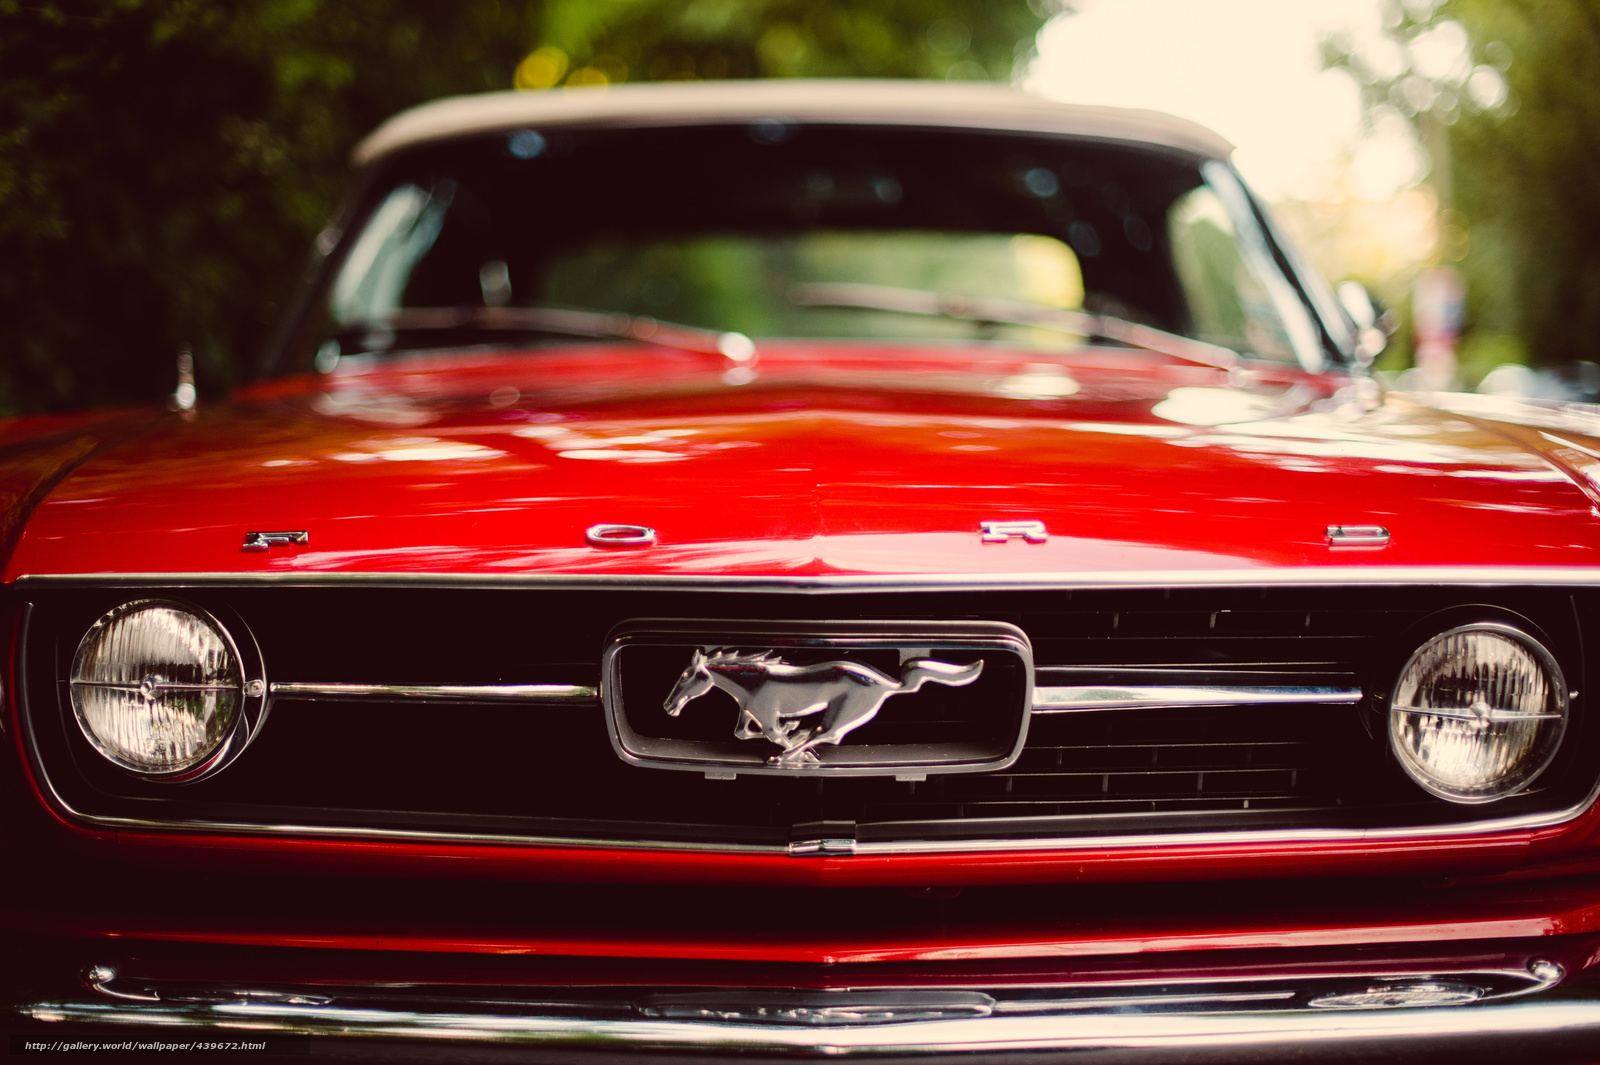 439672 ford Mustang red classic ford mustang krasnyj avto 4163x2770 1600x1065